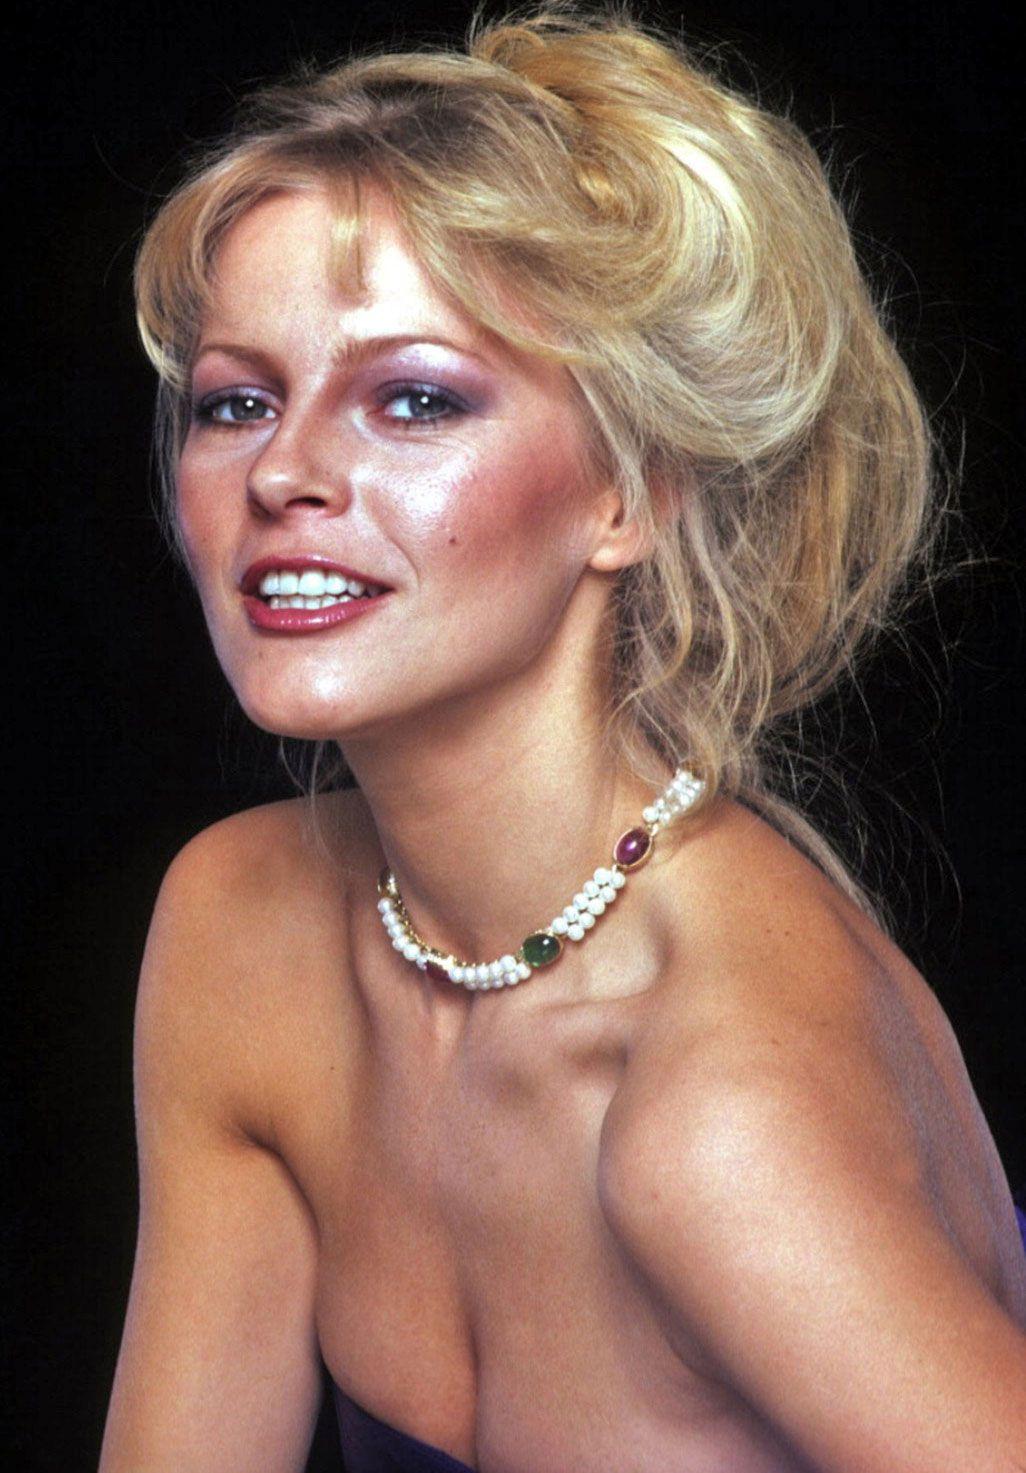 cheryl ladd 1970s lowcut dress world cinema